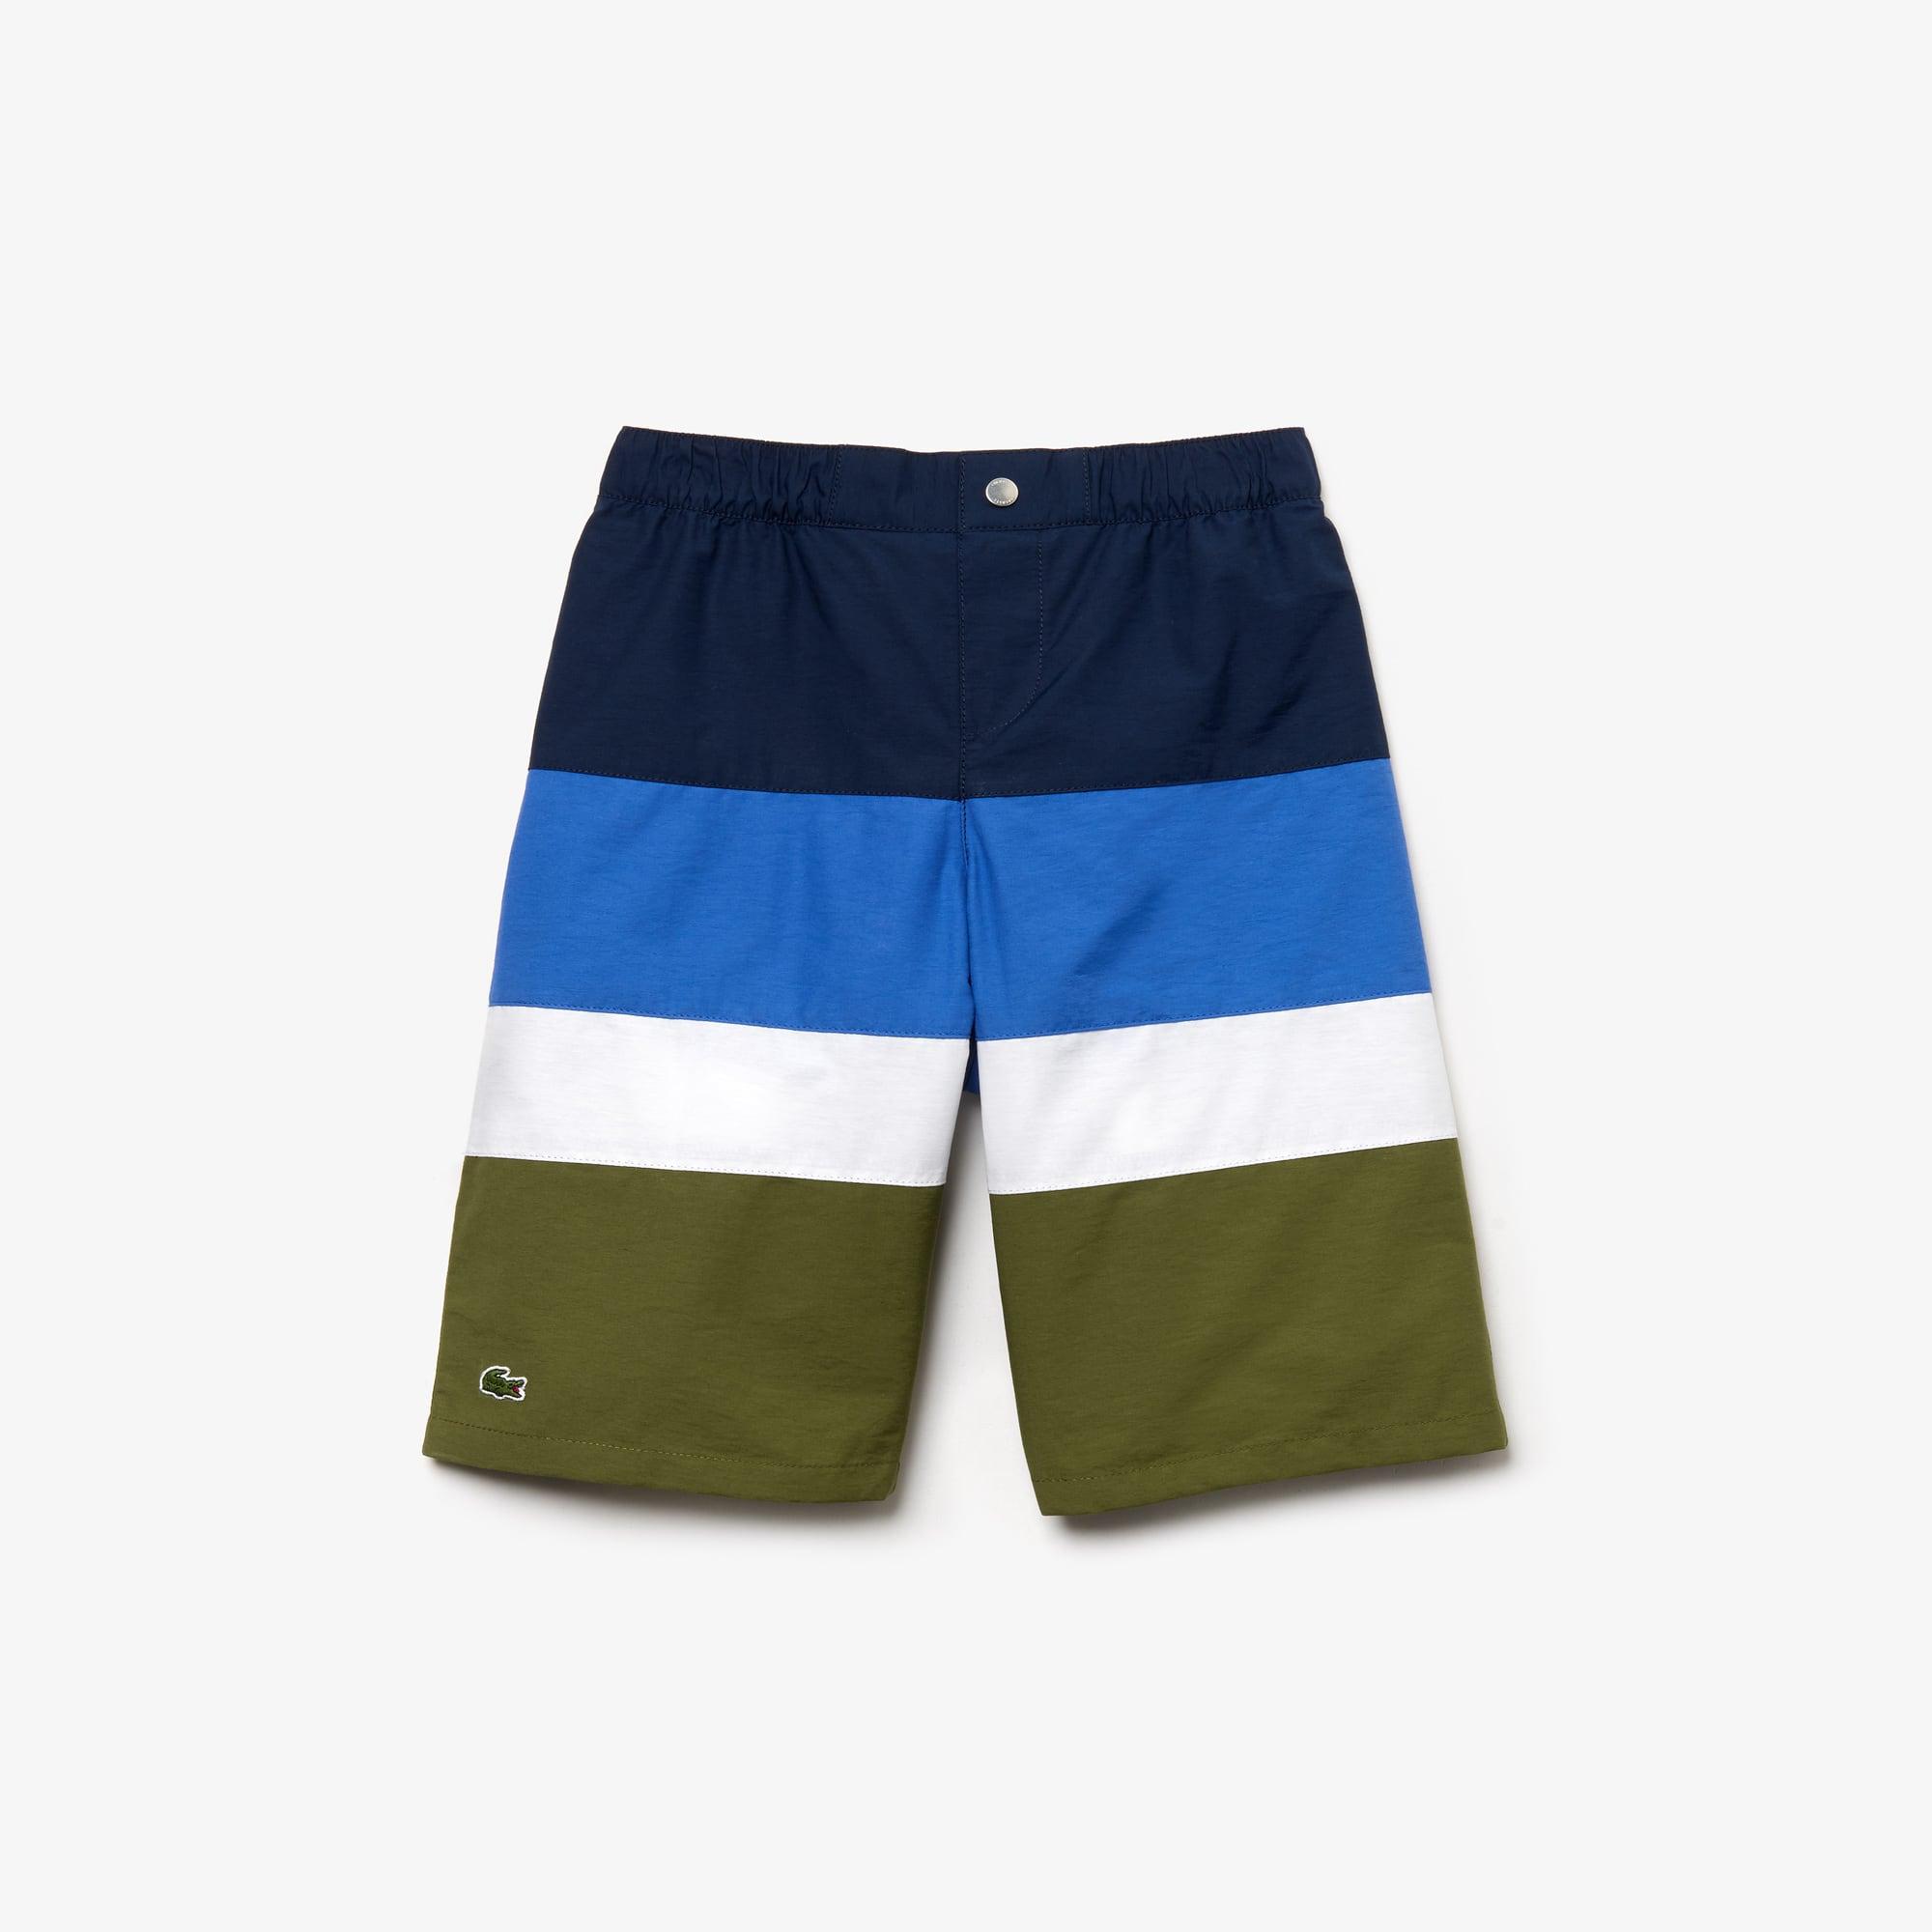 0c8100227f 30% off. Boys' Striped Print Canvas Swimming Trunks